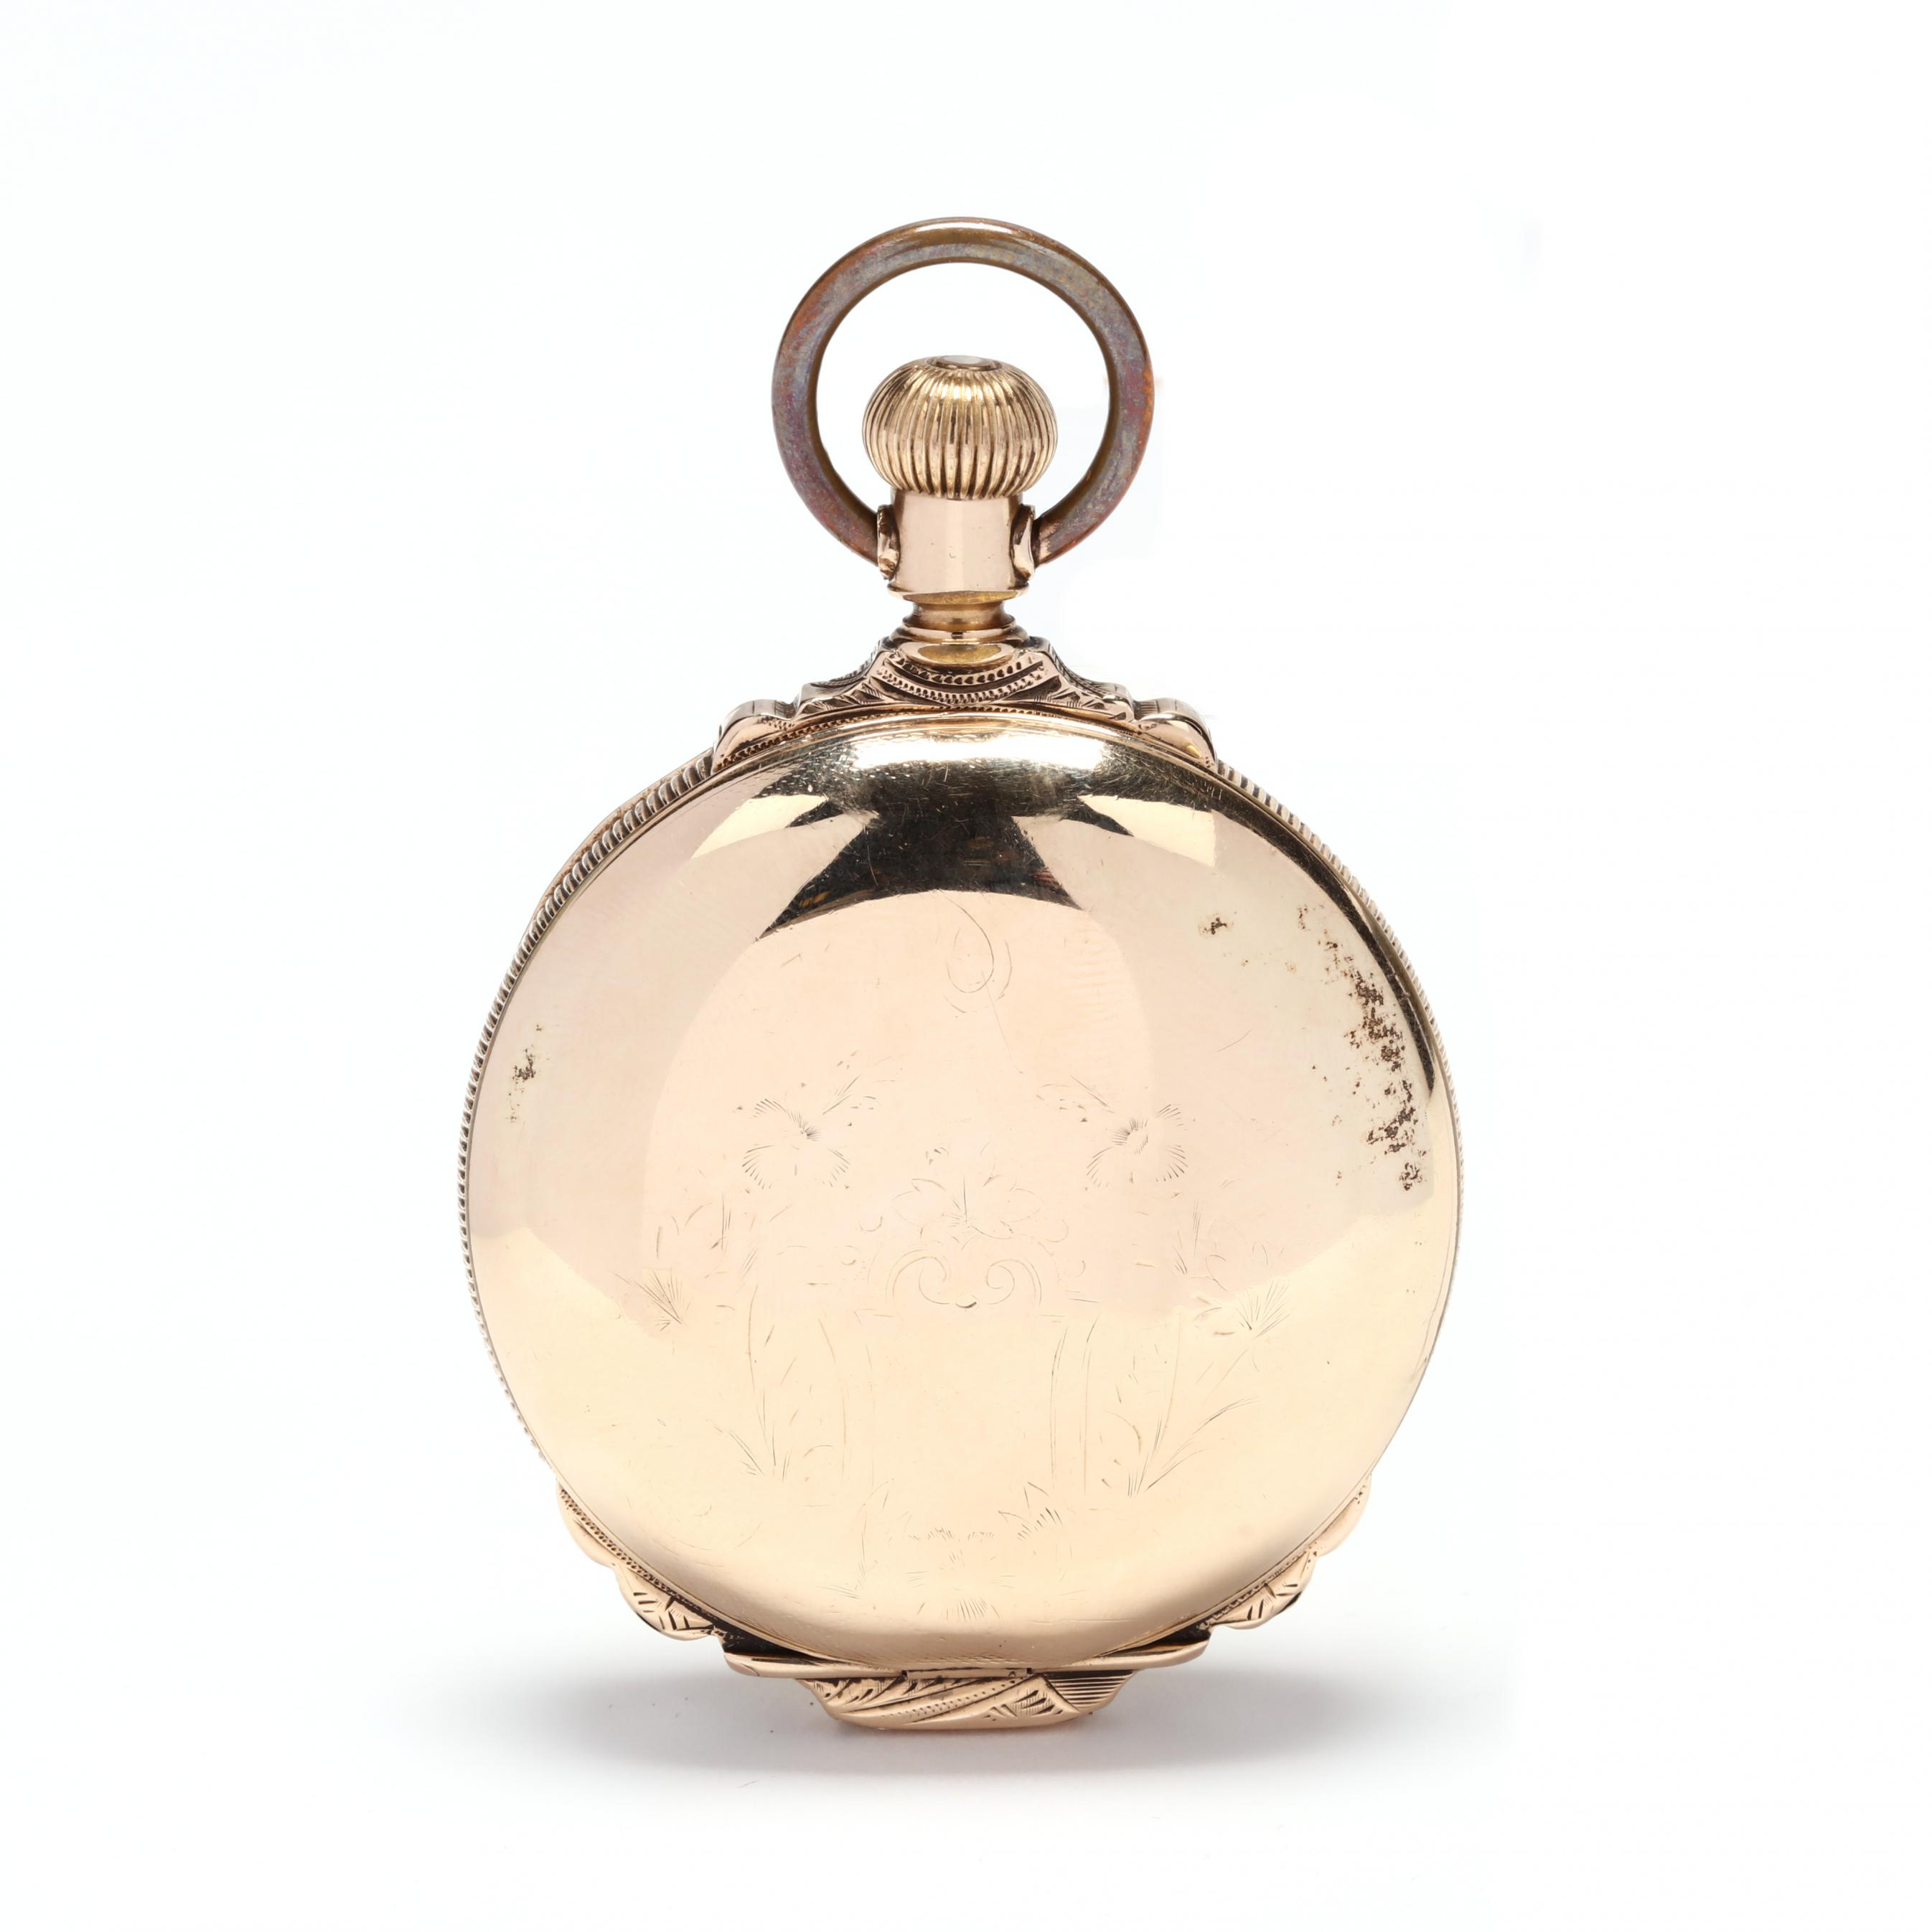 antique-gold-filled-hunter-case-pocket-watch-american-waltham